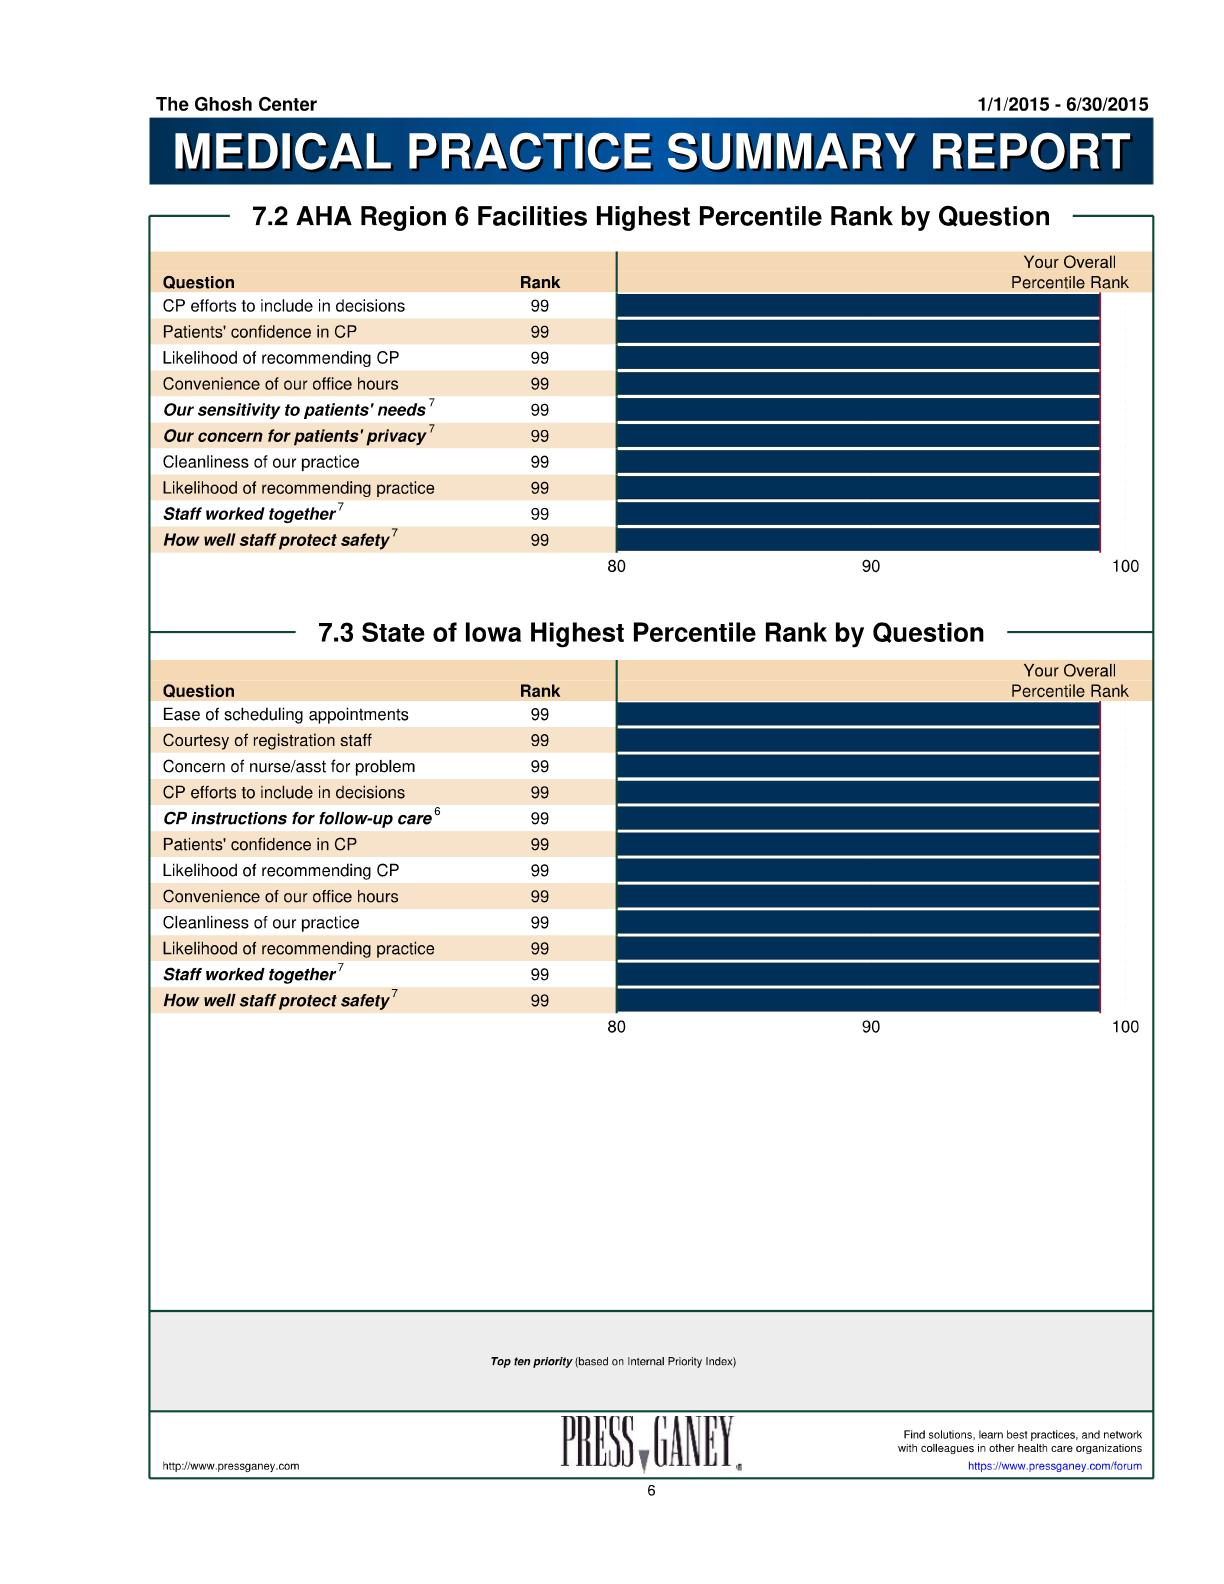 Press Ganey Regional-State Scores2015